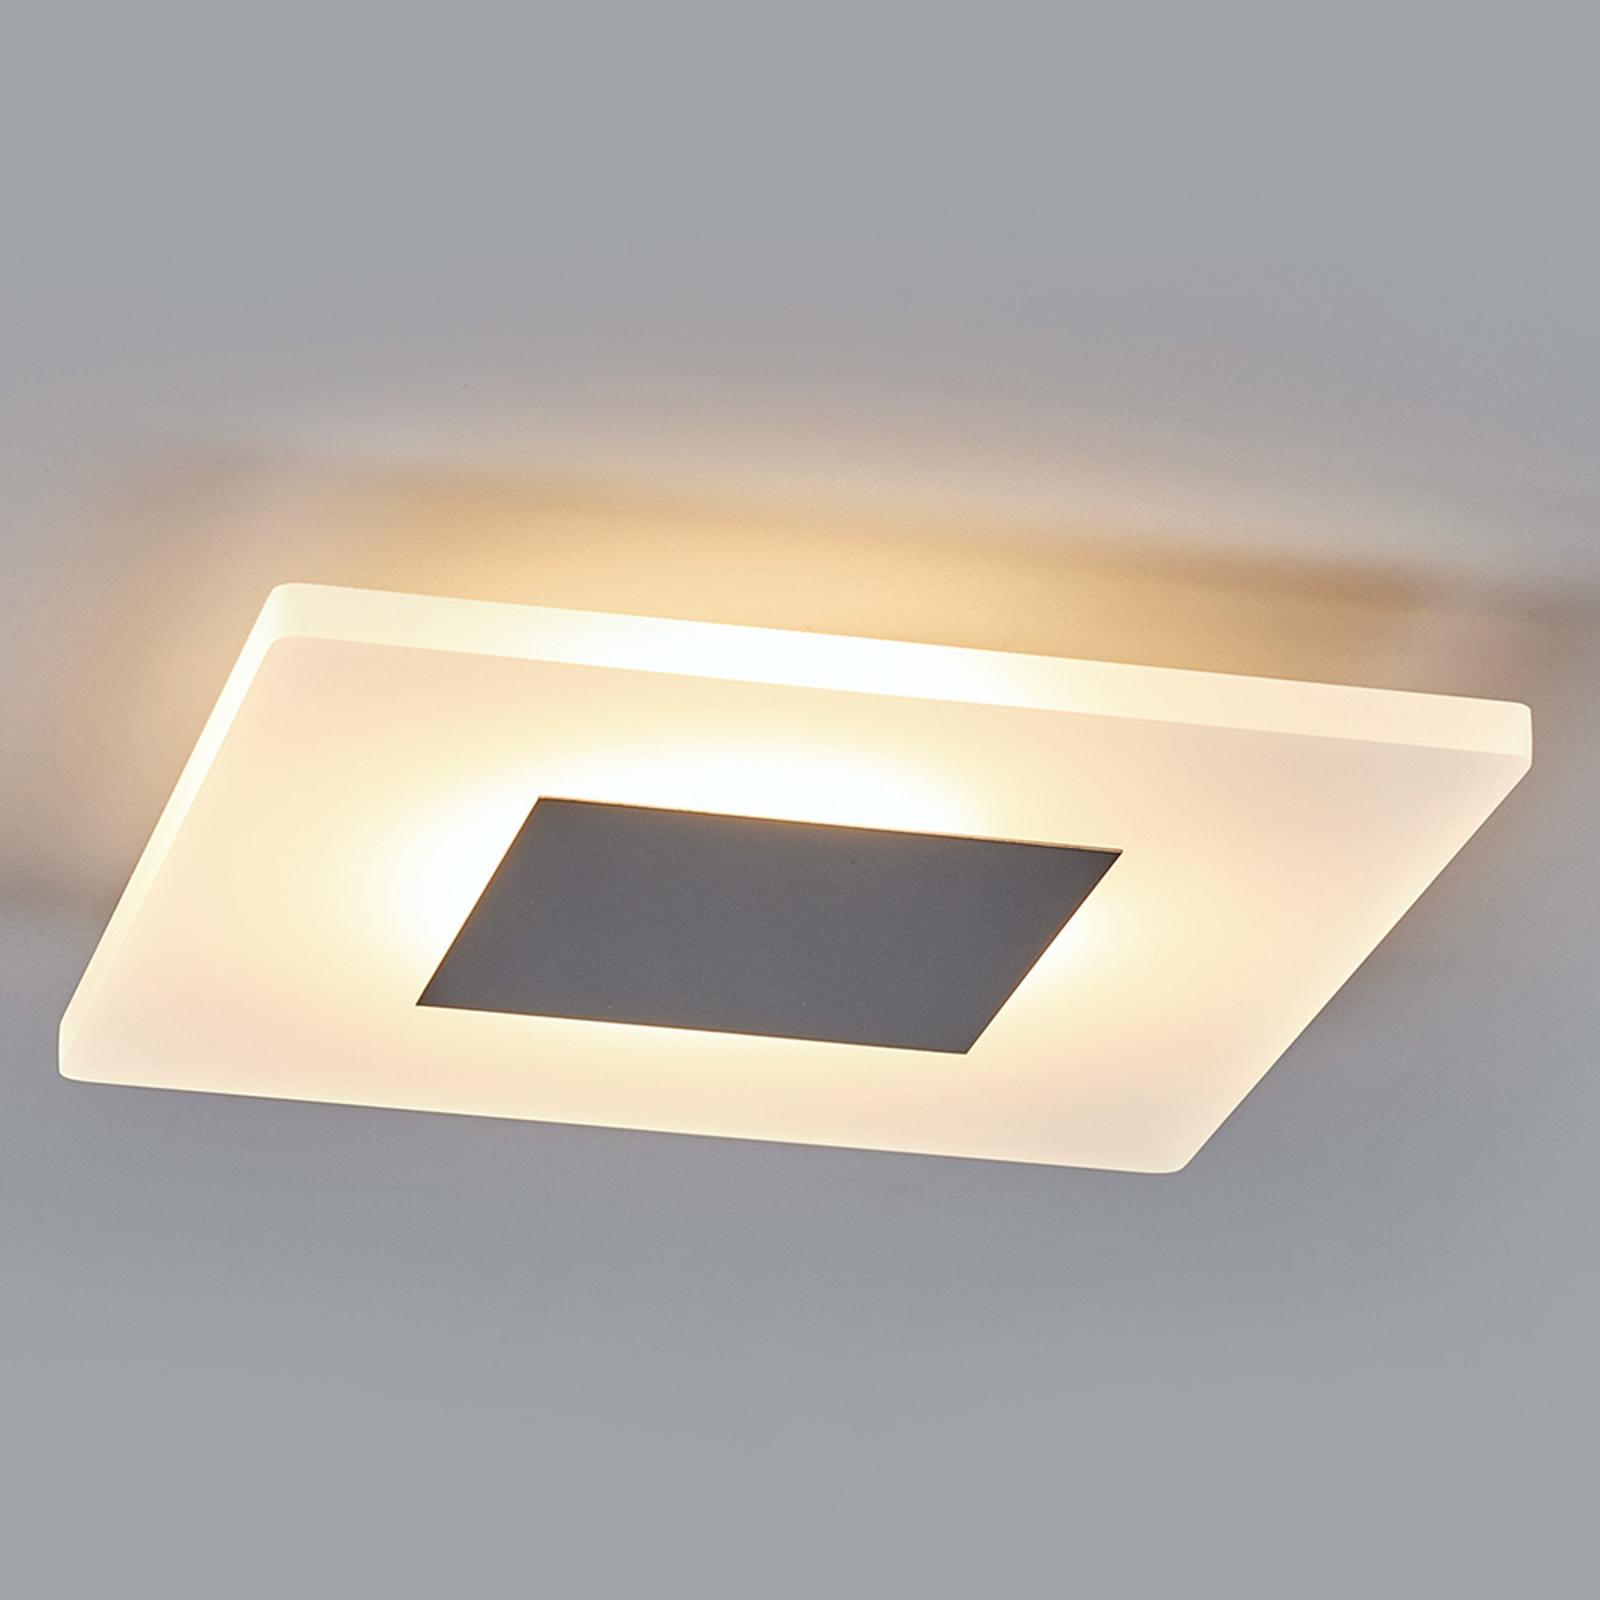 TARJA - prostokątna lampa sufitowa LED